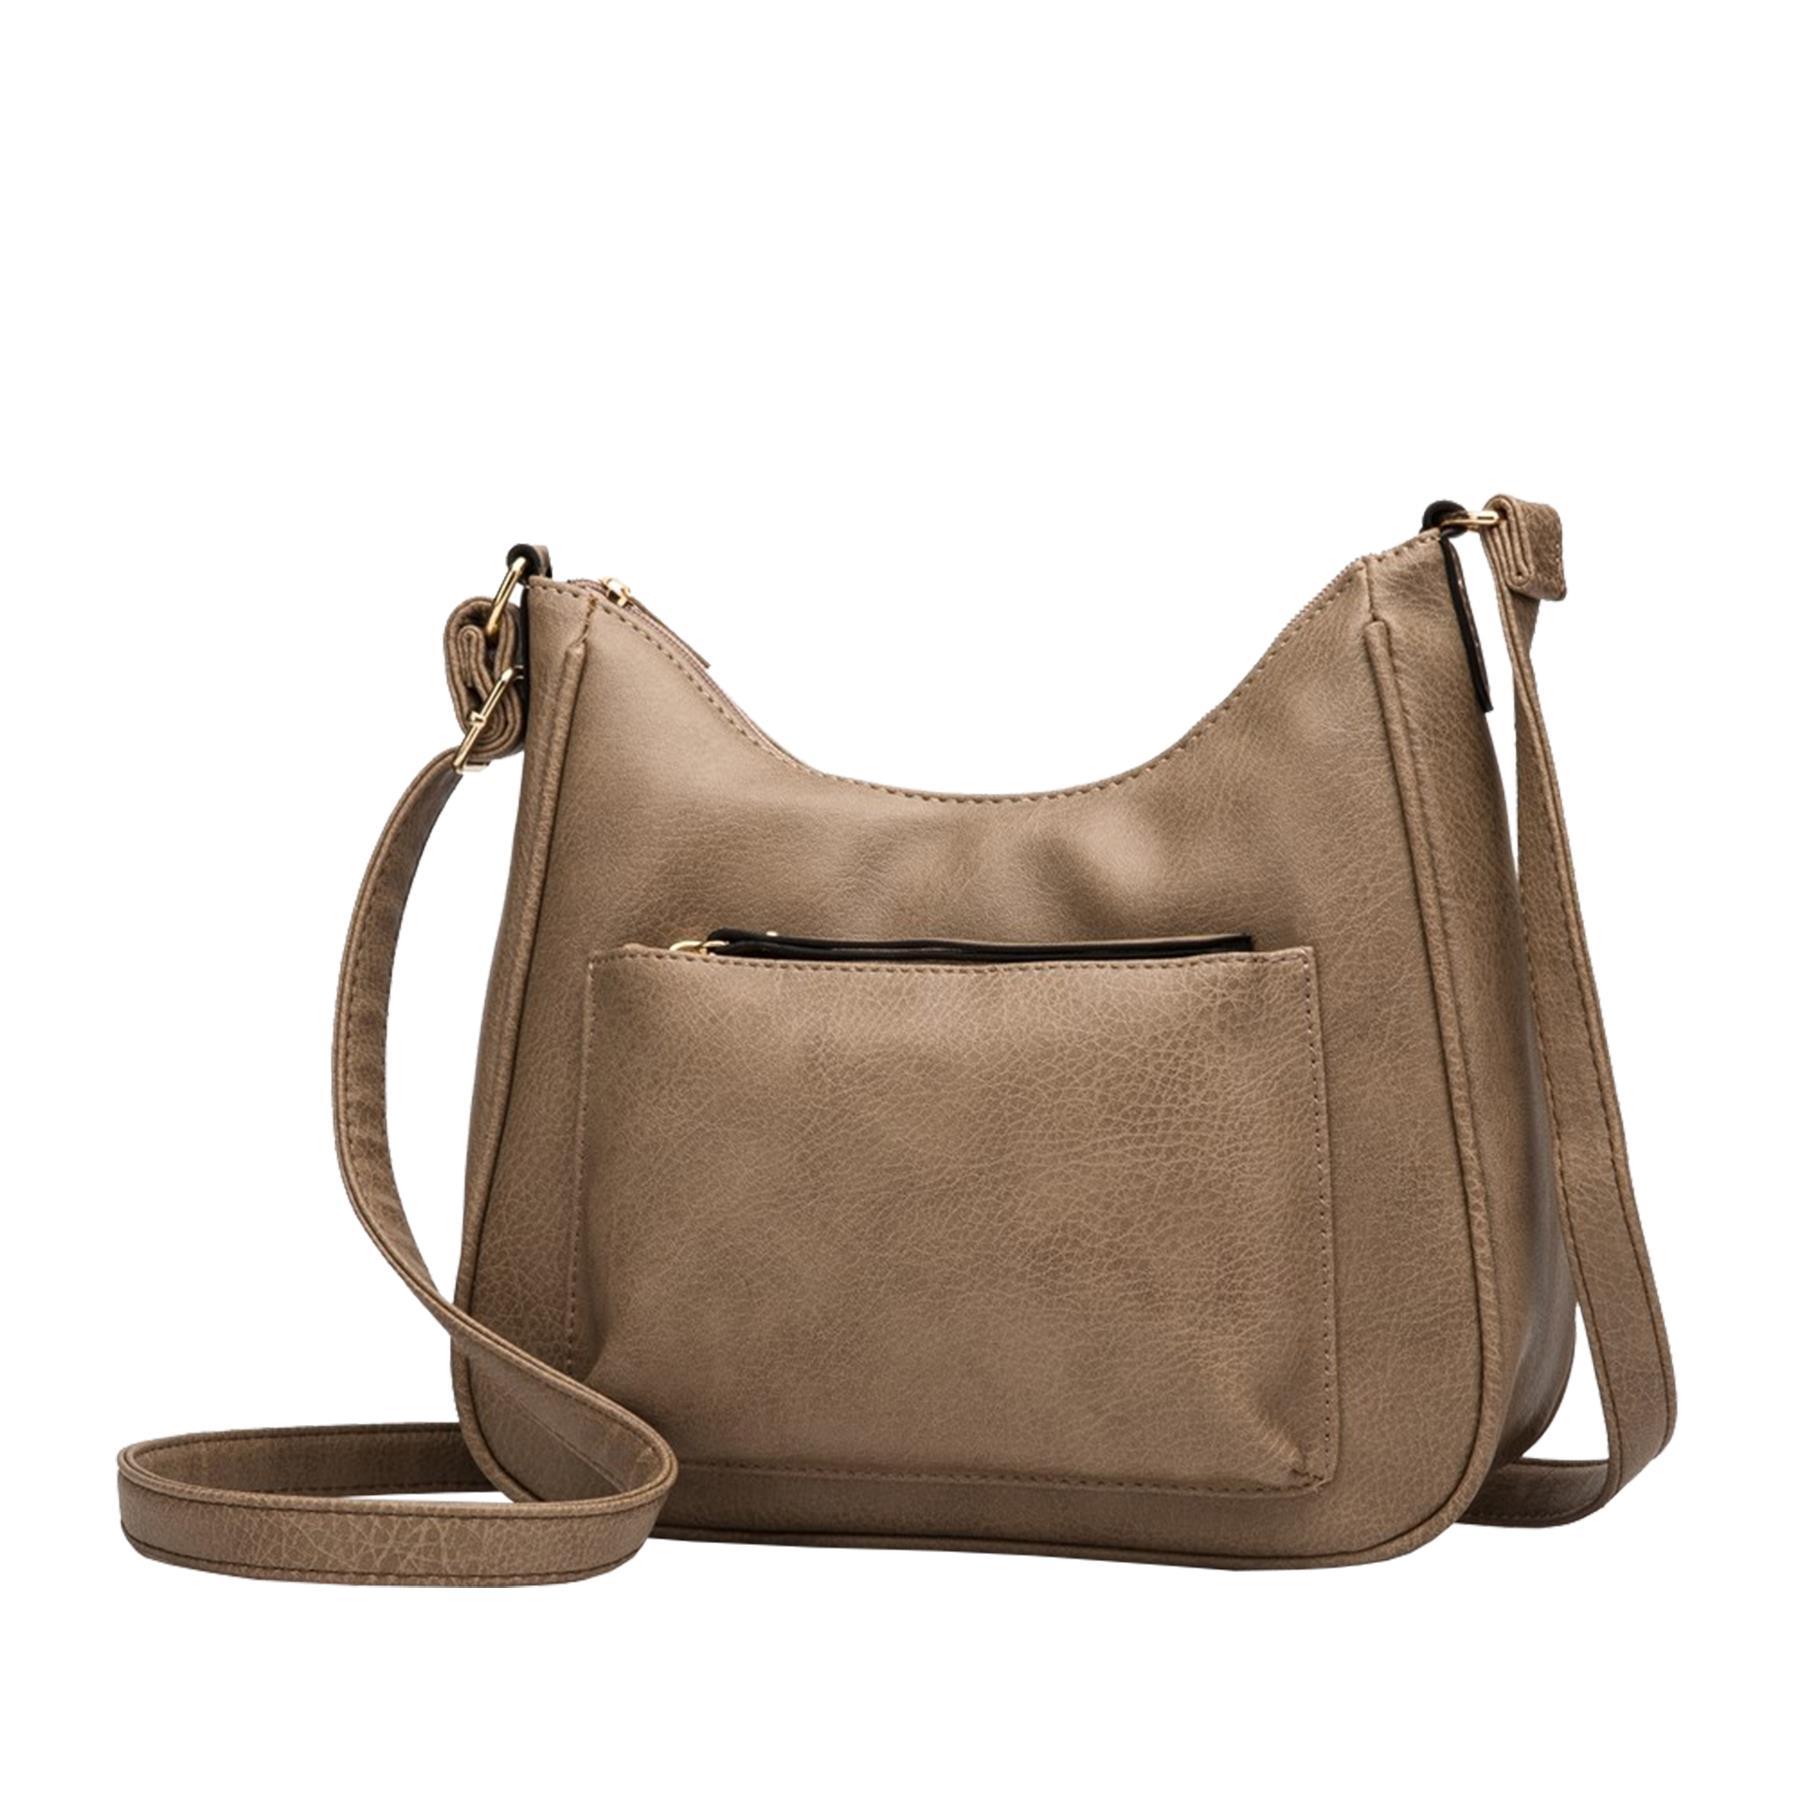 New-Soft-Synthetic-Leather-Front-Pocket-Ladies-Casual-Crossbody-Bag-Handbag thumbnail 9